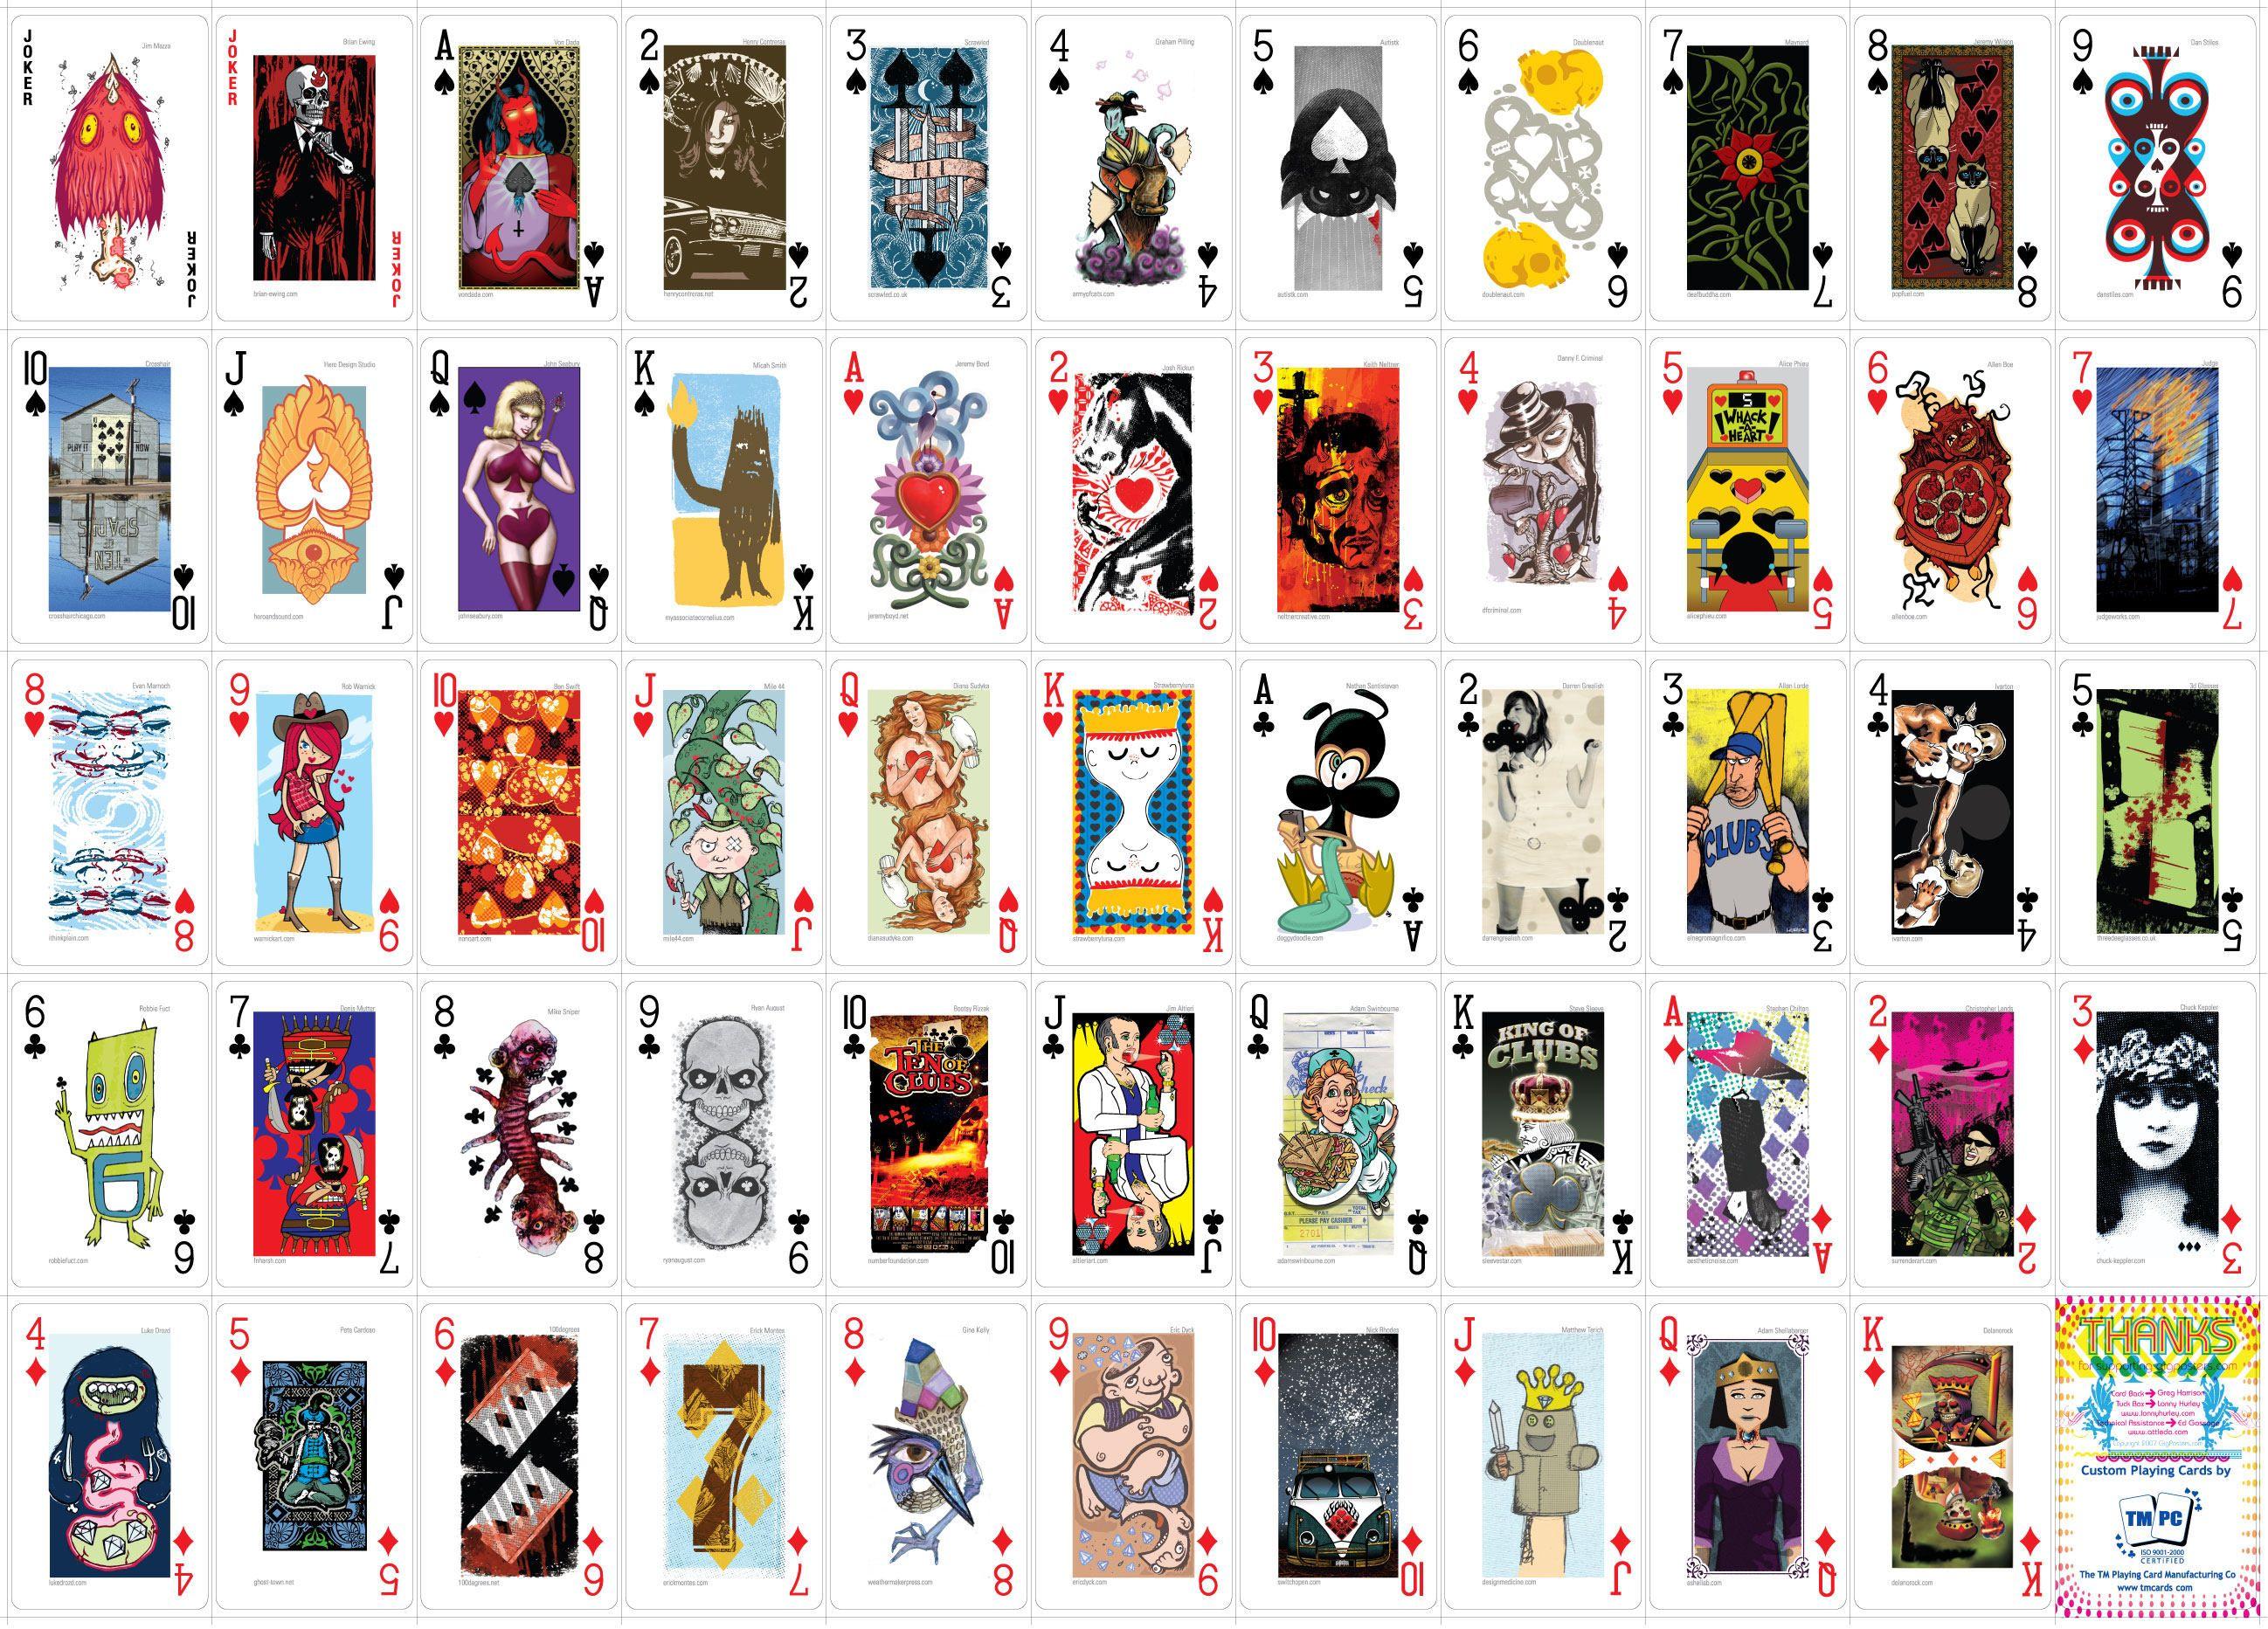 James Eads Tarot Card Set Release Tarot Cards Art Card Art Tarot